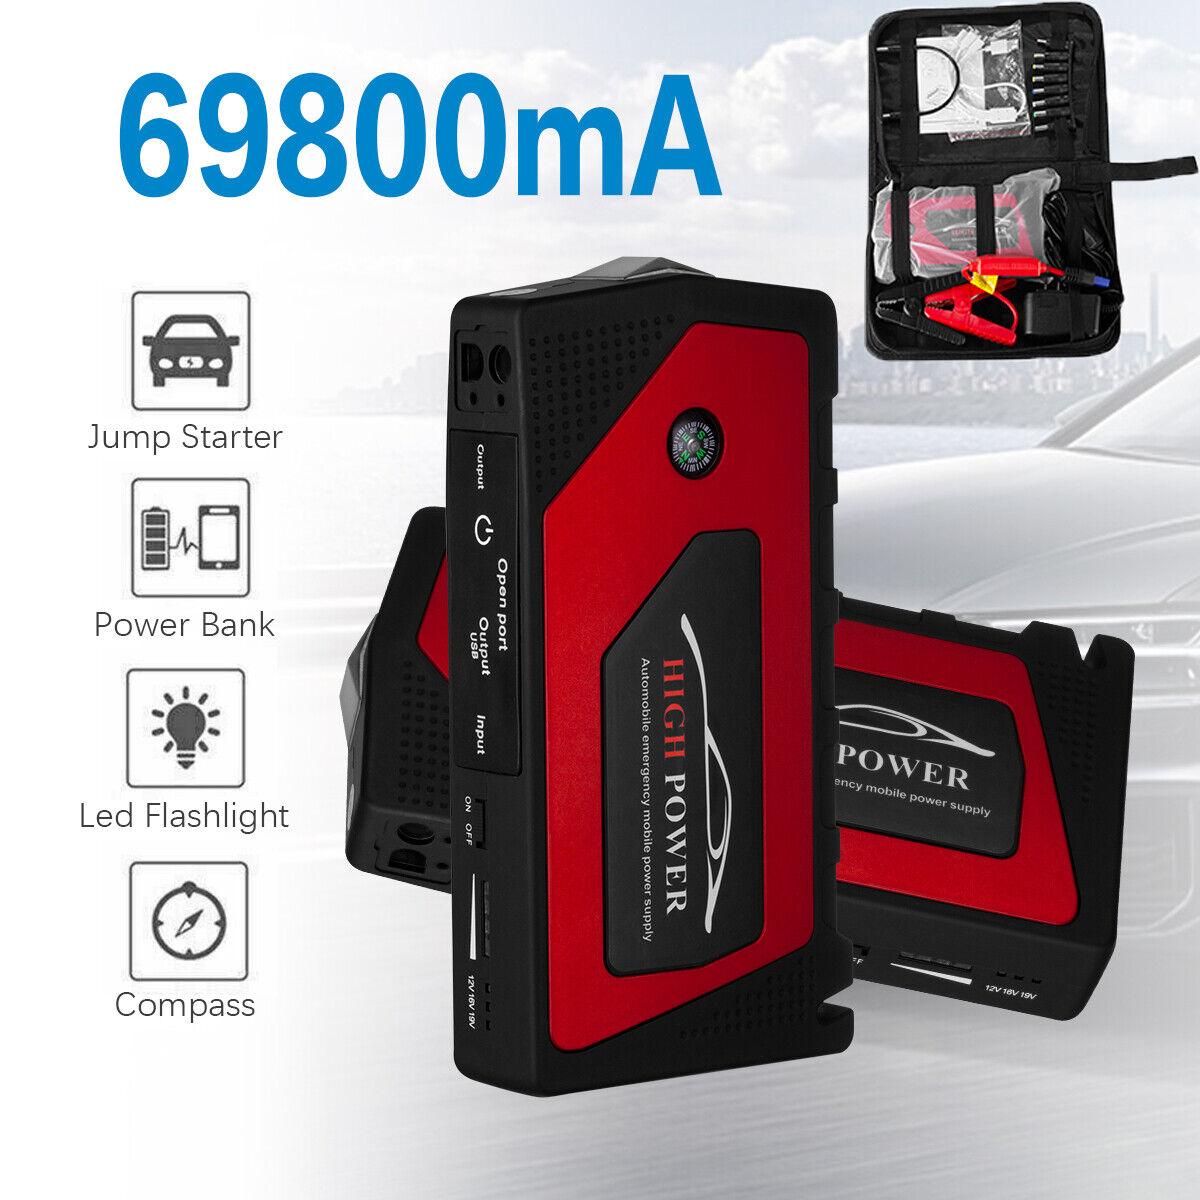 69800mAh Car Jump Starter 12V Portable USB Power Bank Battery Booster Box Clamp